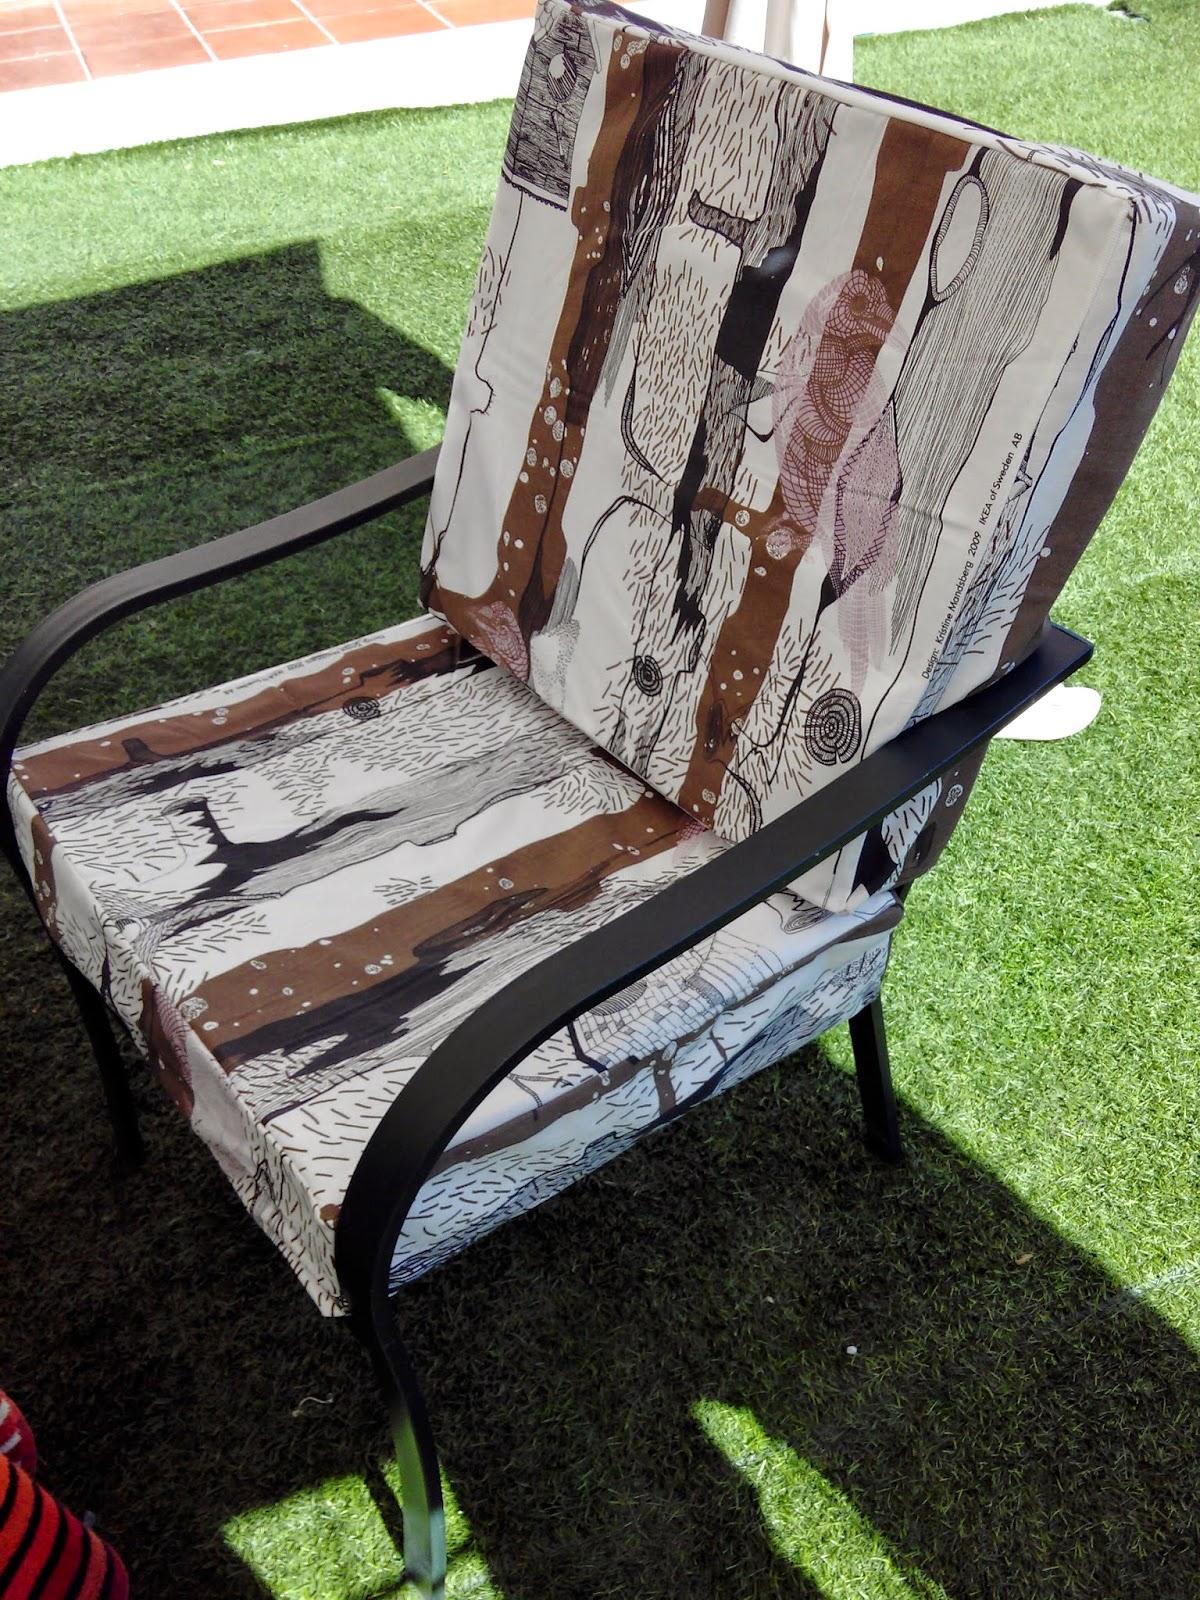 Lamoiss fundas para los sillones del jard n for Sillones de jardin